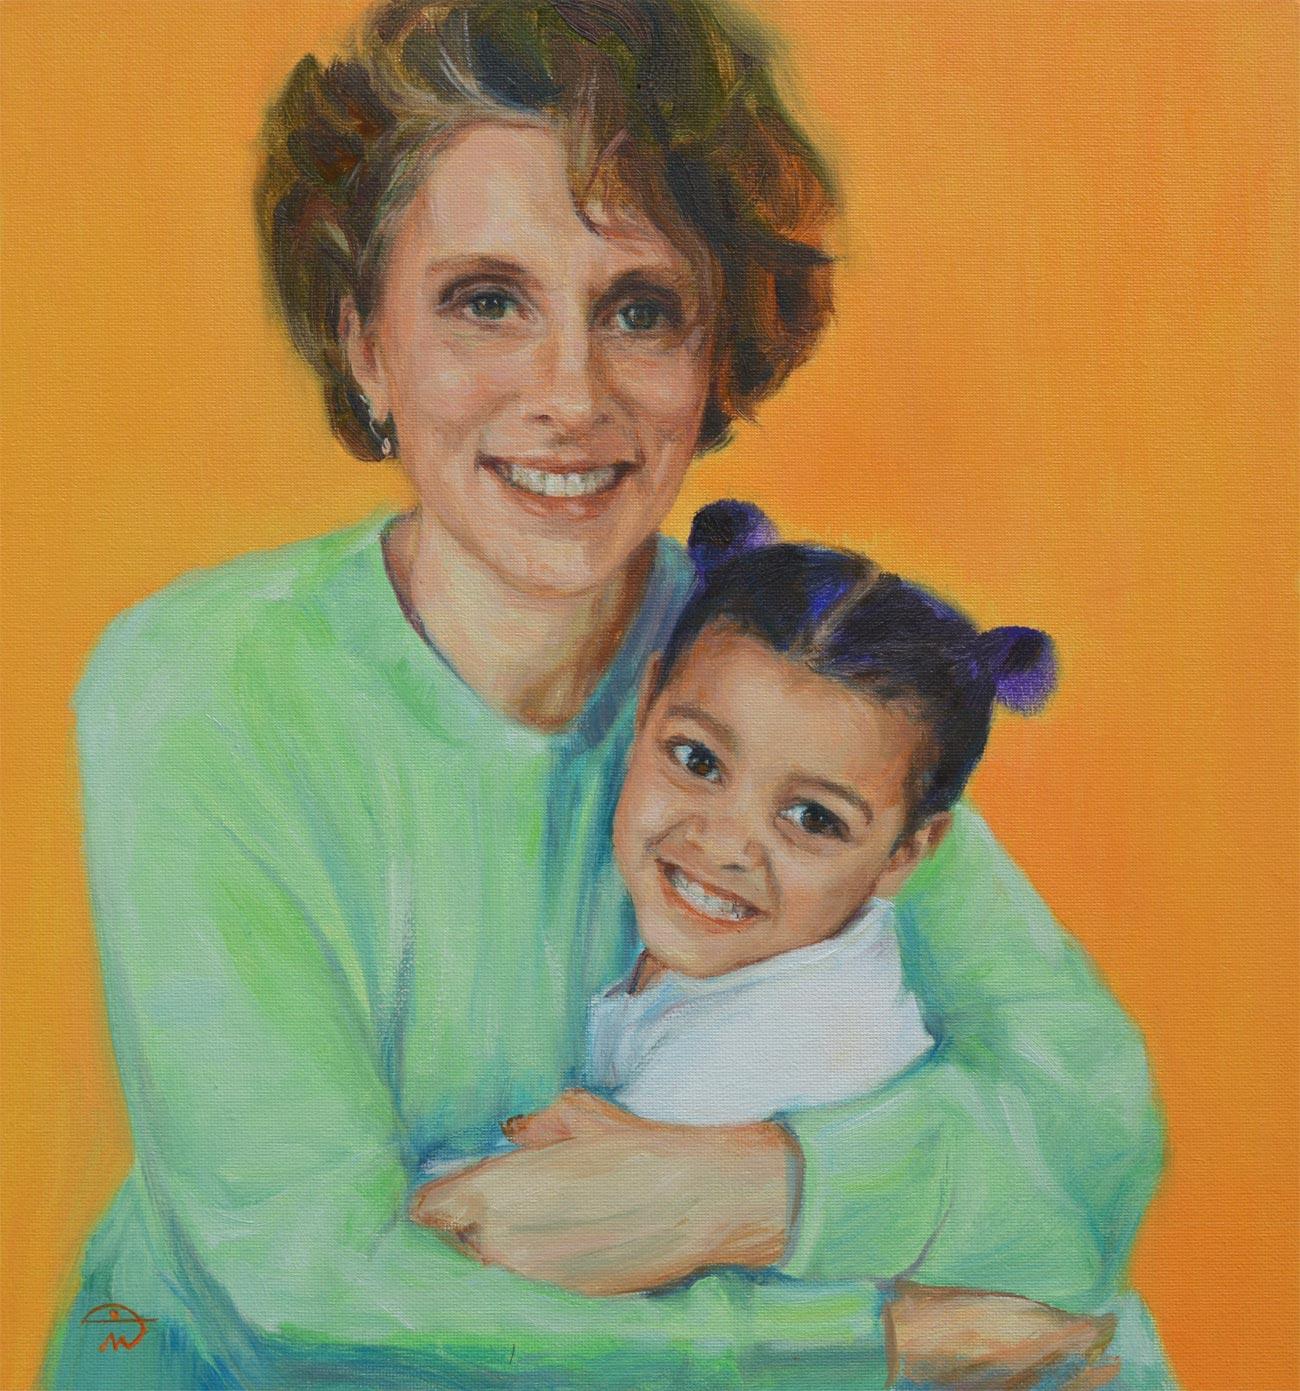 With my Grandma. Commission a portrait by British artist Marina Kim